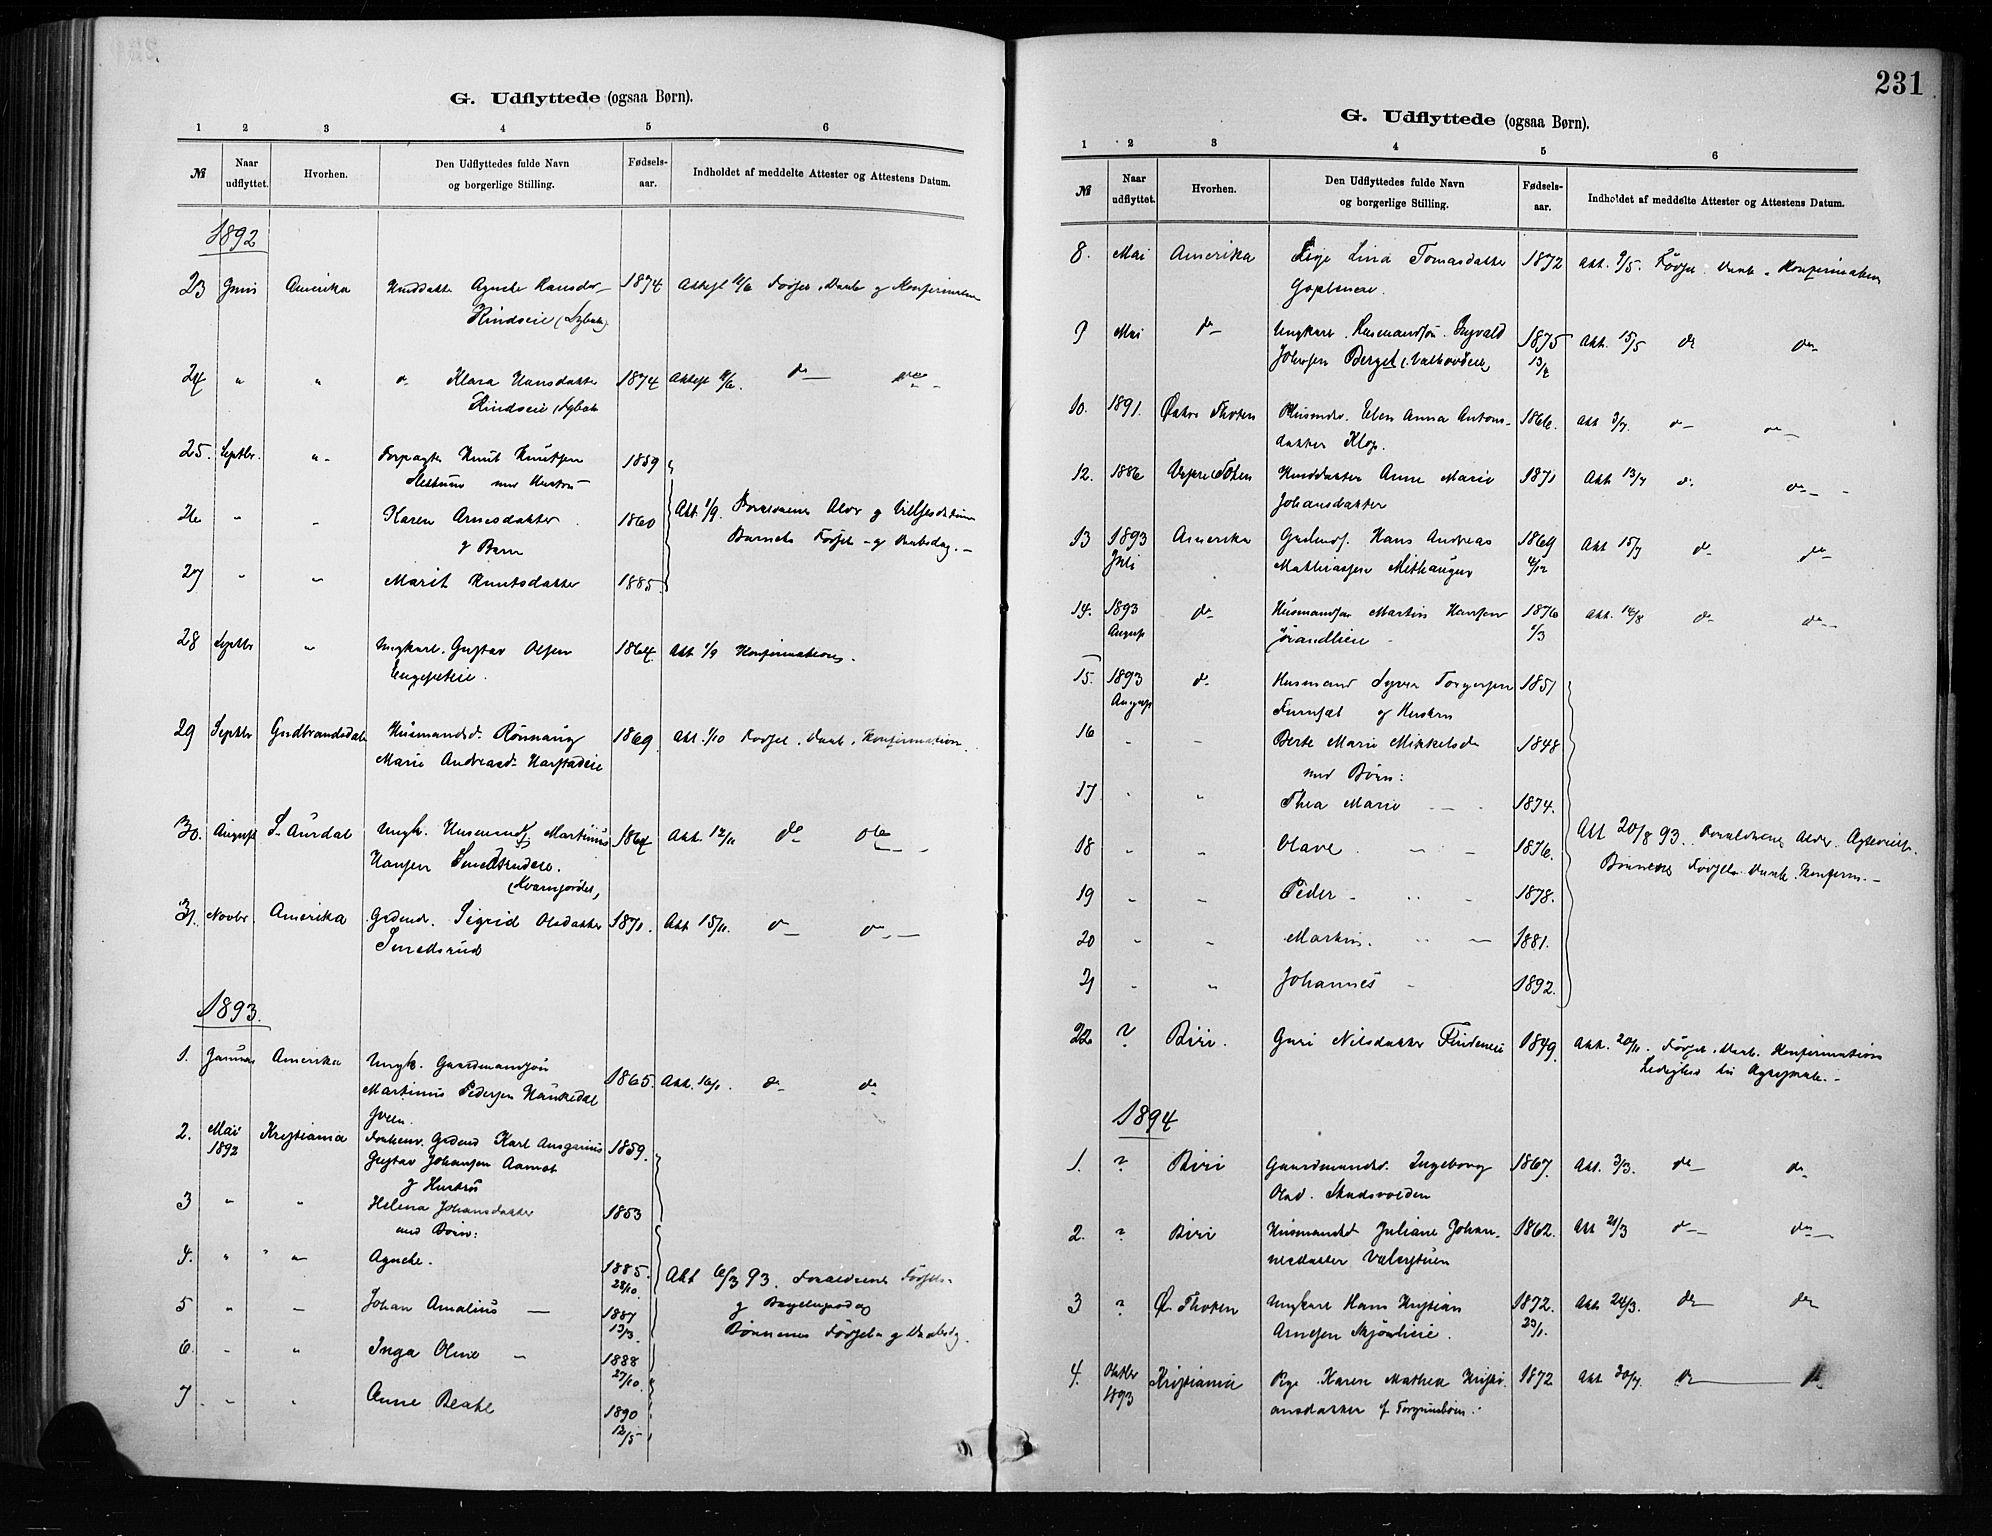 SAH, Nordre Land prestekontor, Ministerialbok nr. 4, 1882-1896, s. 231